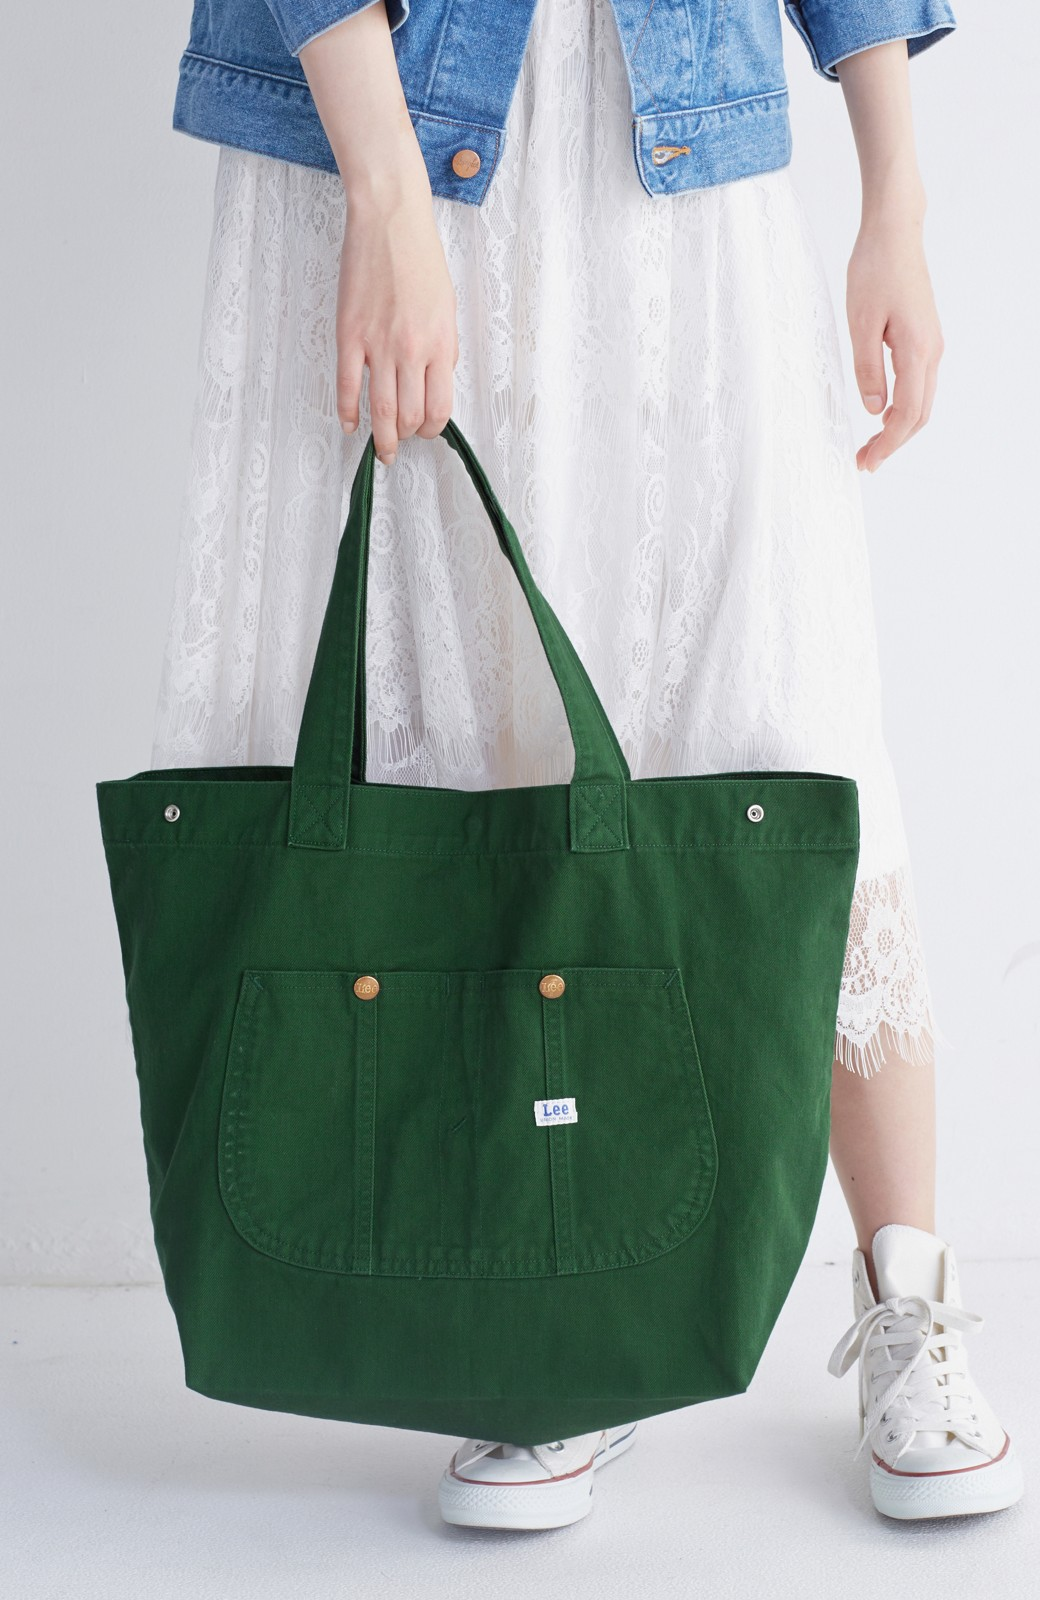 haco! Lee 大きい野菜もらくらく入るエコショッピングバッグ <グリーン>の商品写真10